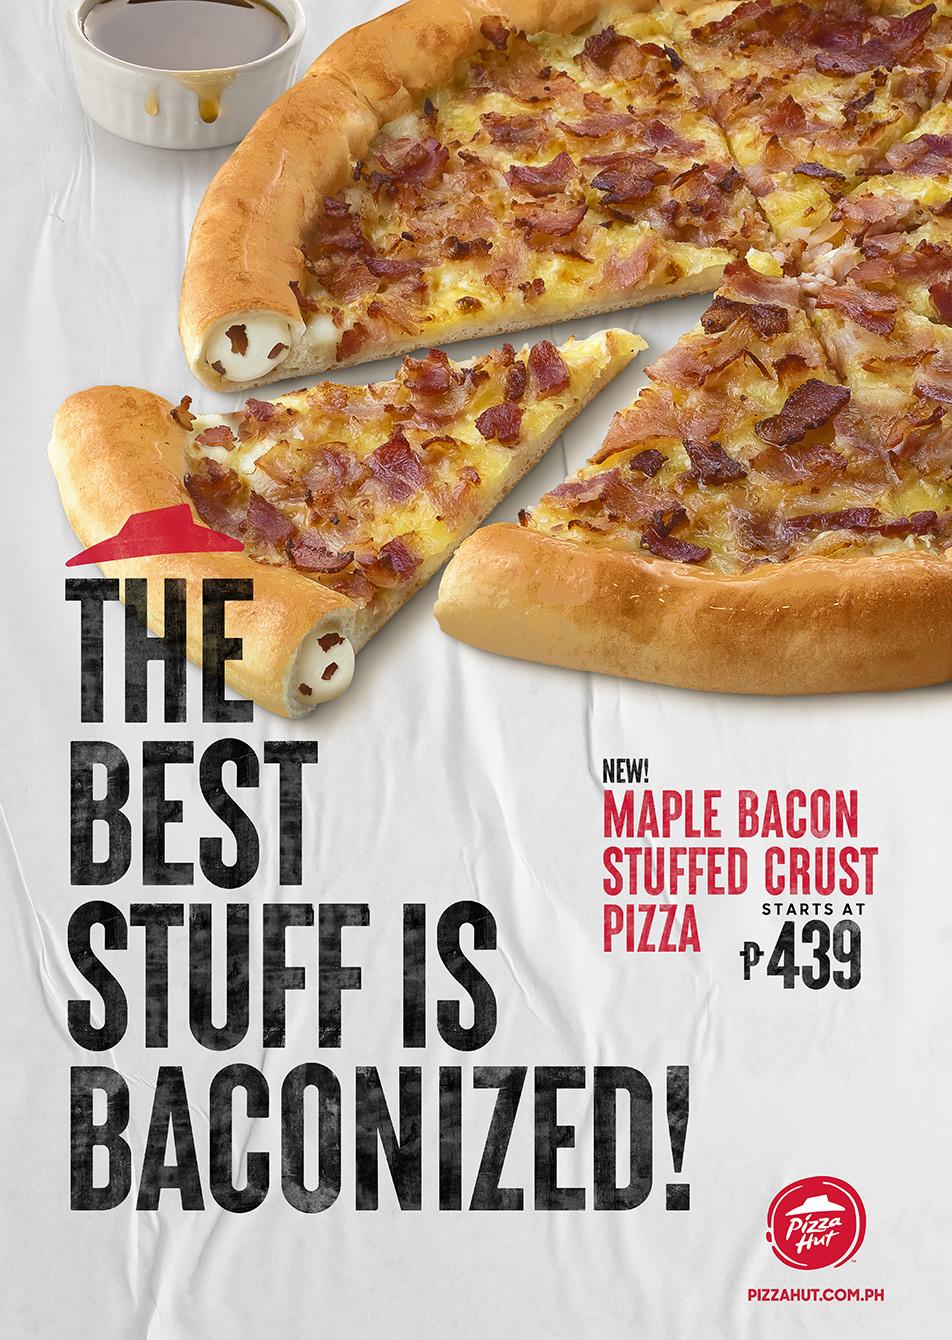 Pizza Hut's Maple Bacon Stuffed Crust Pizza